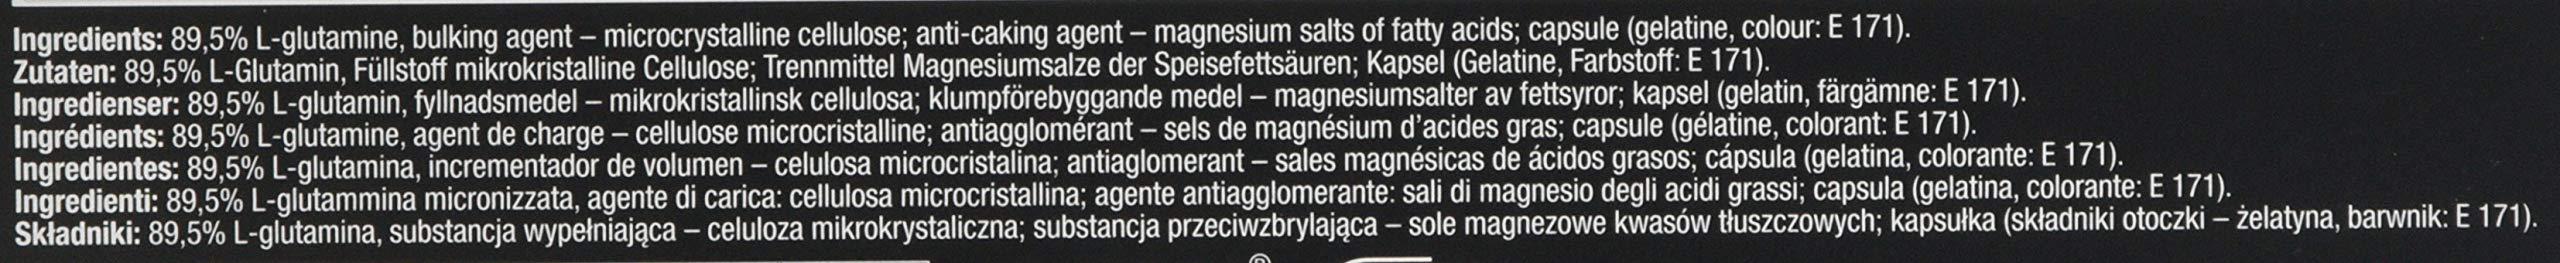 71yBqnAOL8L - Olimp Labs L-Glutamine Capsules, Pack of 120 Mega Capsules 24757